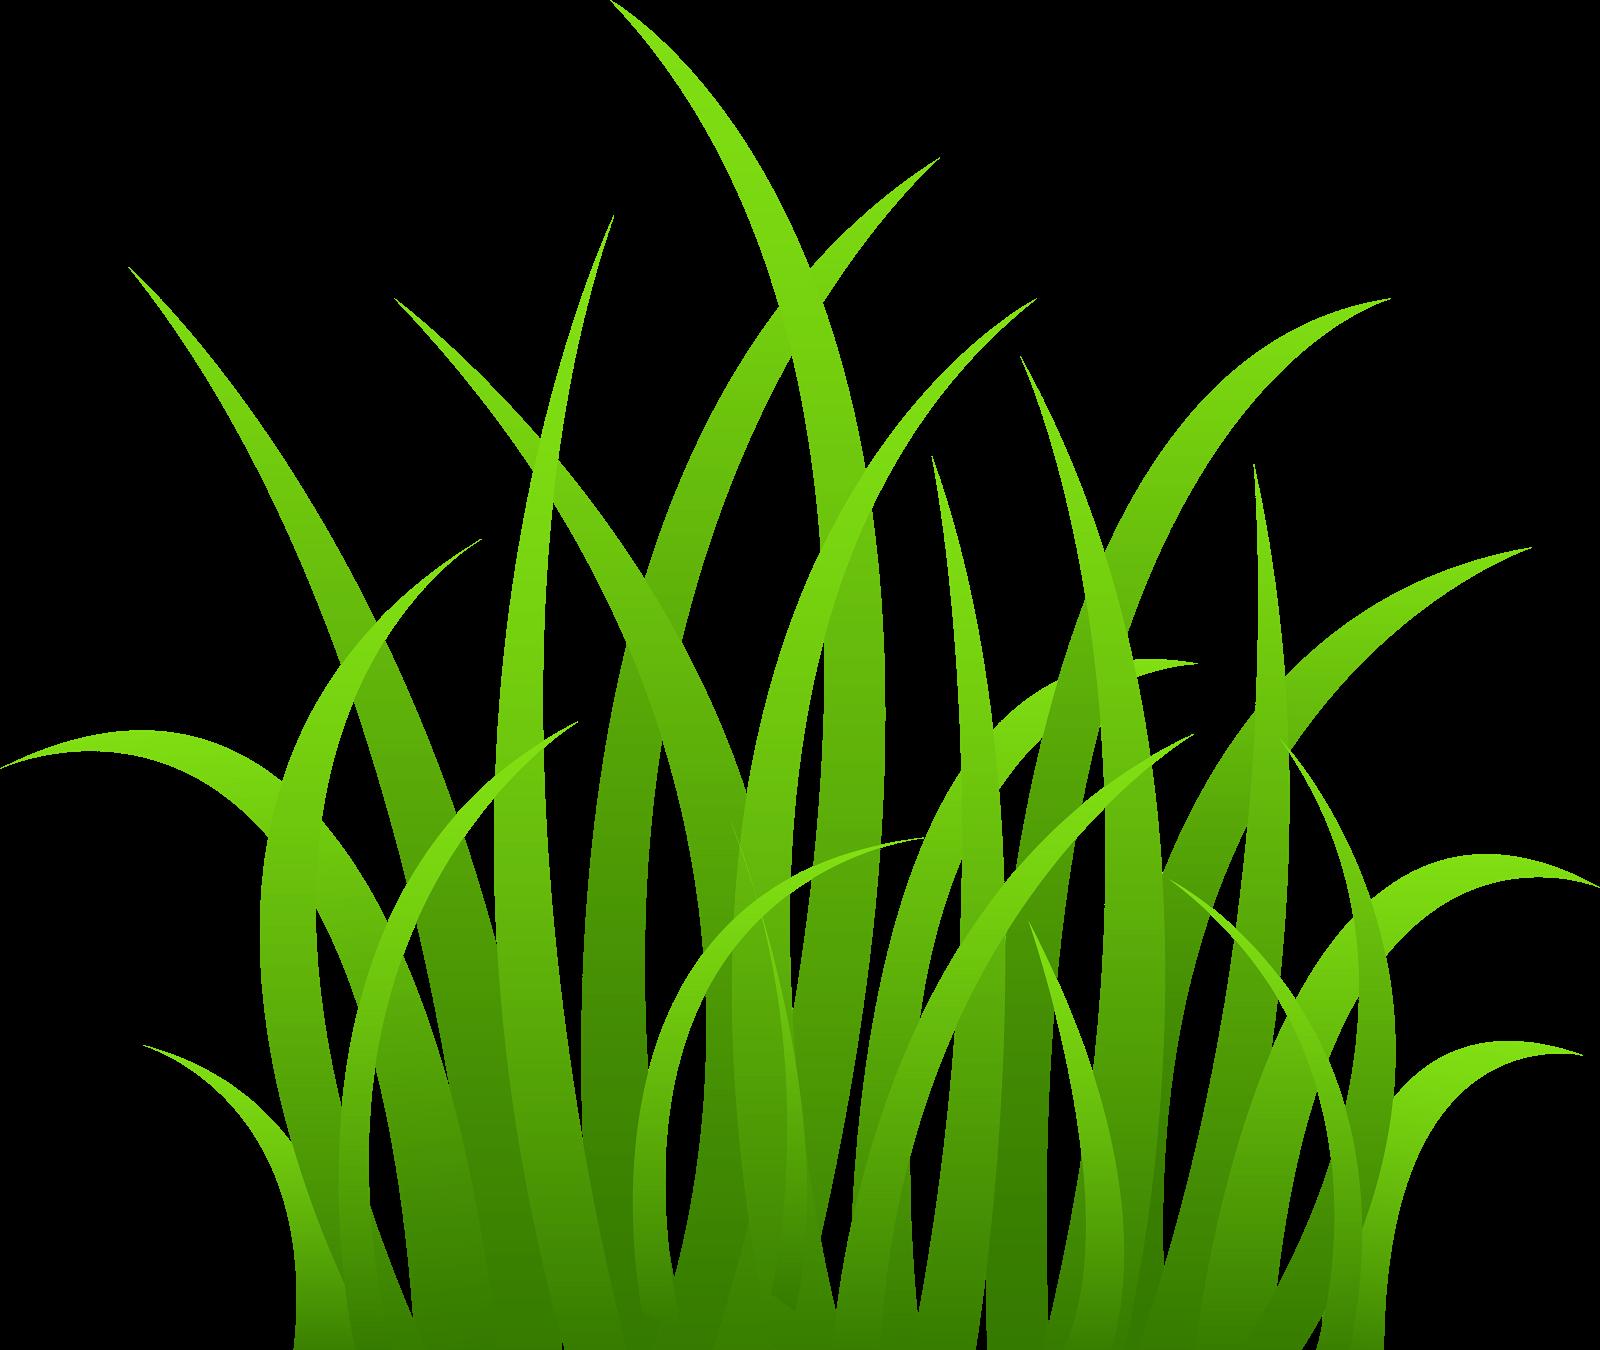 Grass clip art free clipart images 3